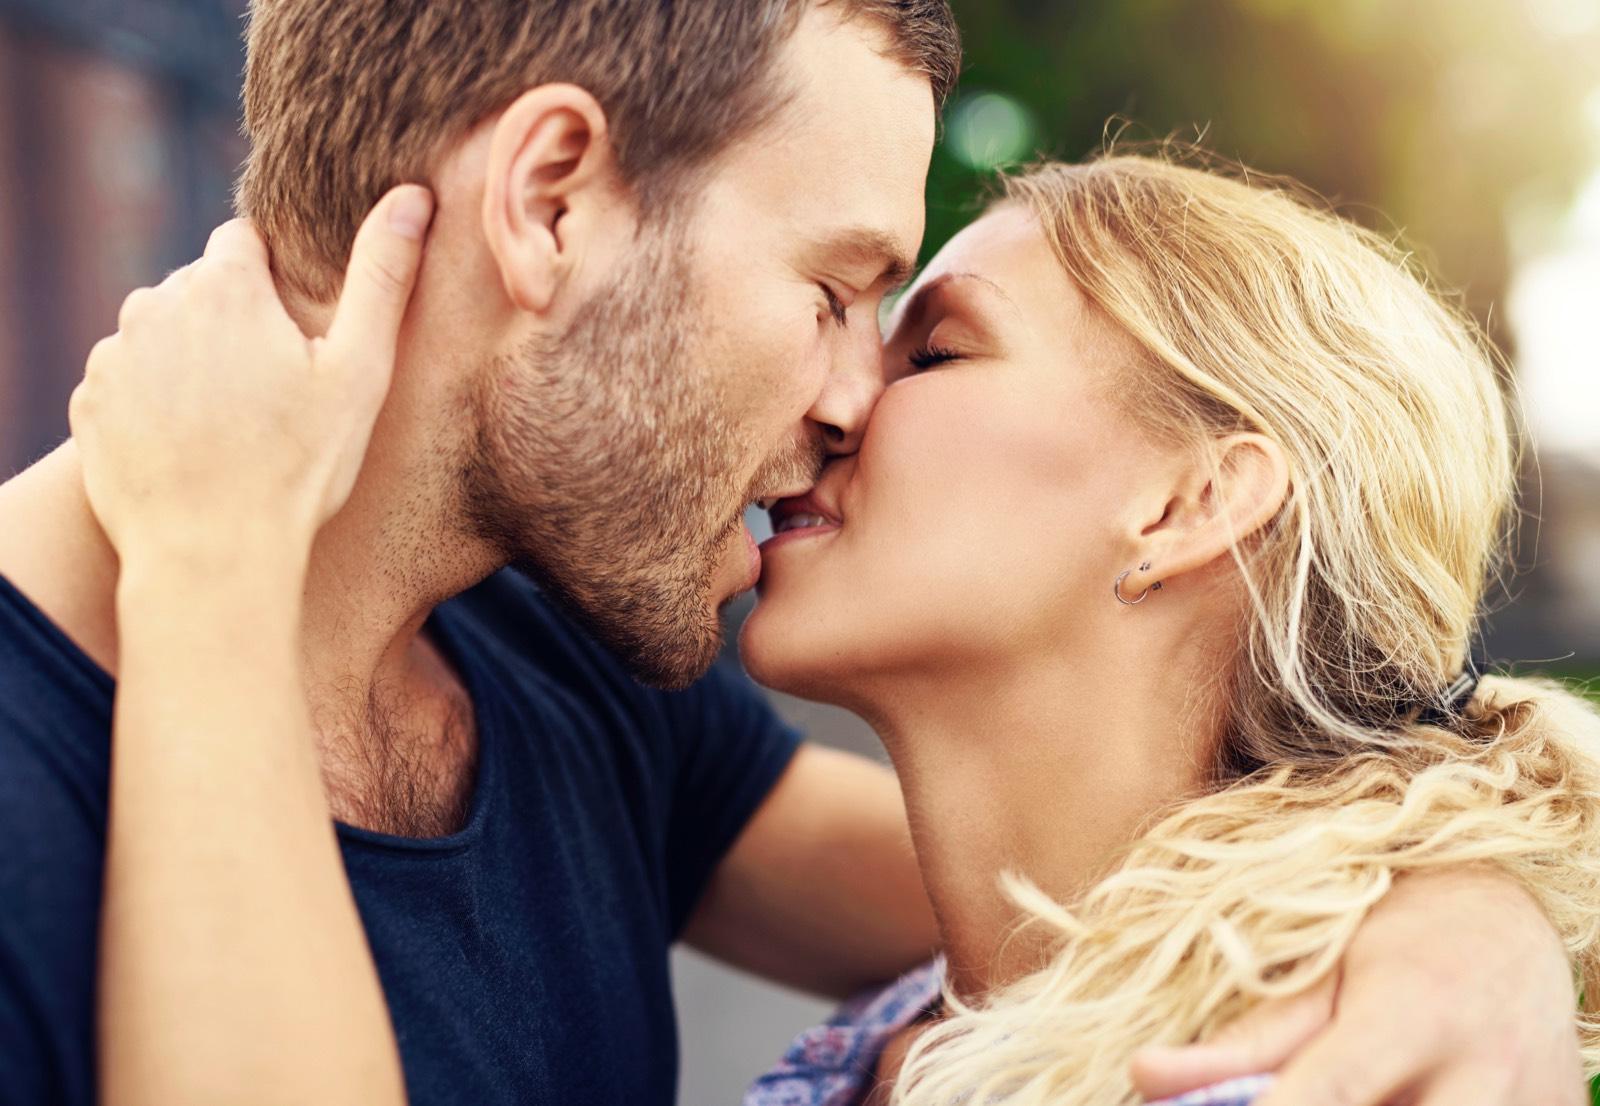 amateur live sex hiusmallit pyöreille kasvoille